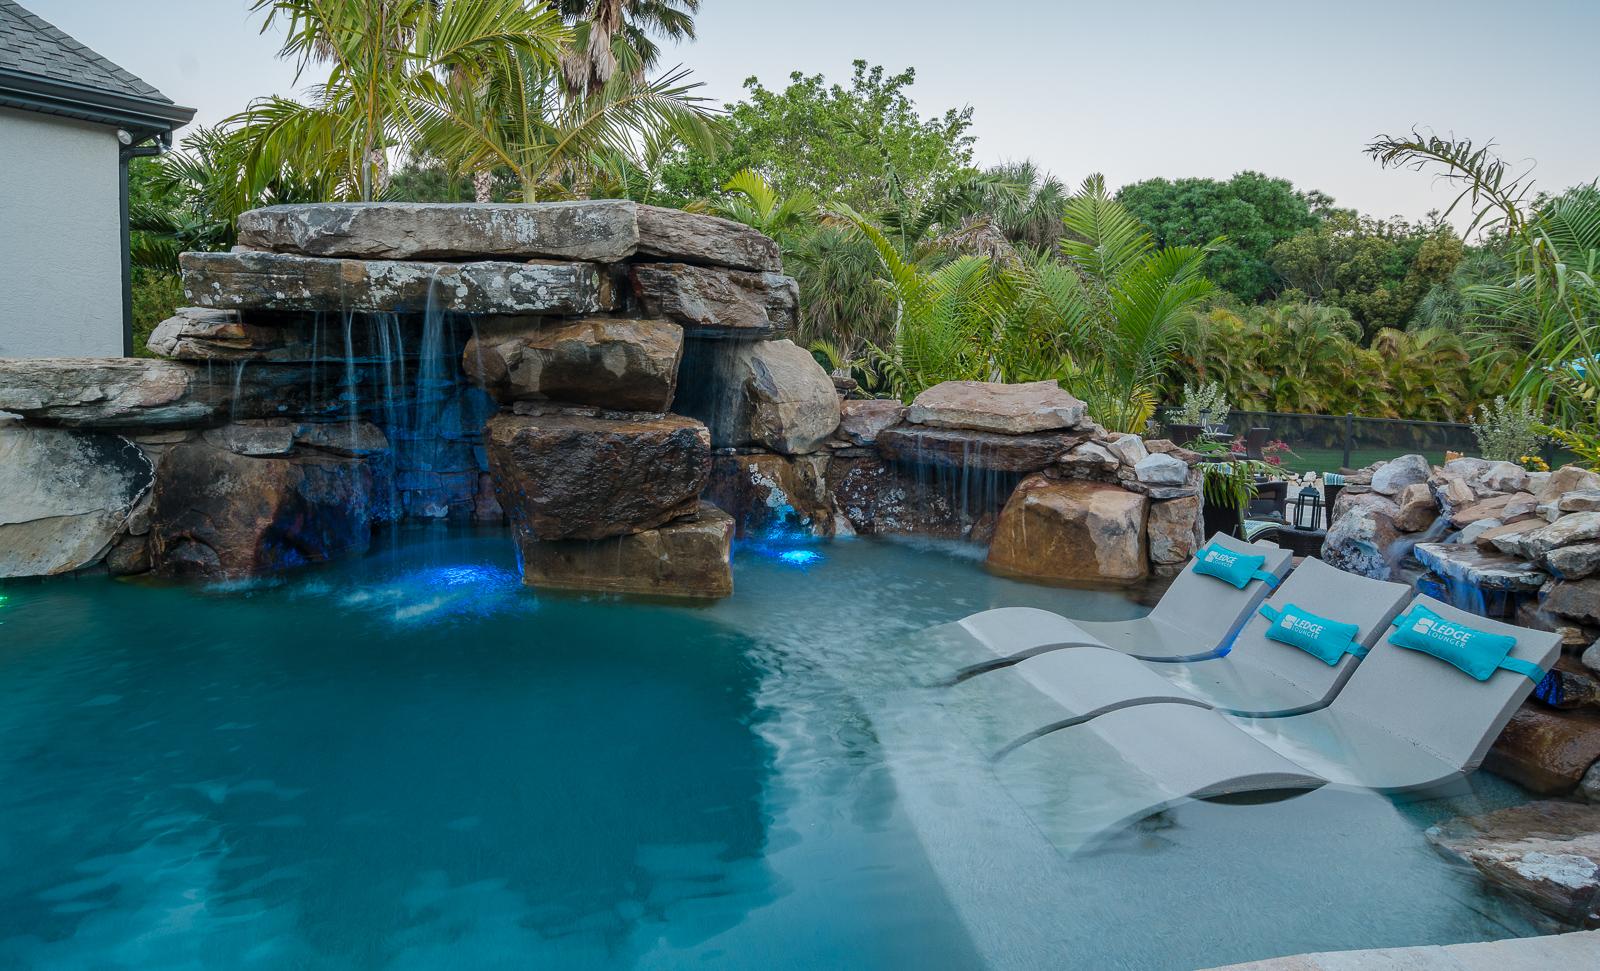 Insane pools tv episode fiesta de laguna for Pool kings design